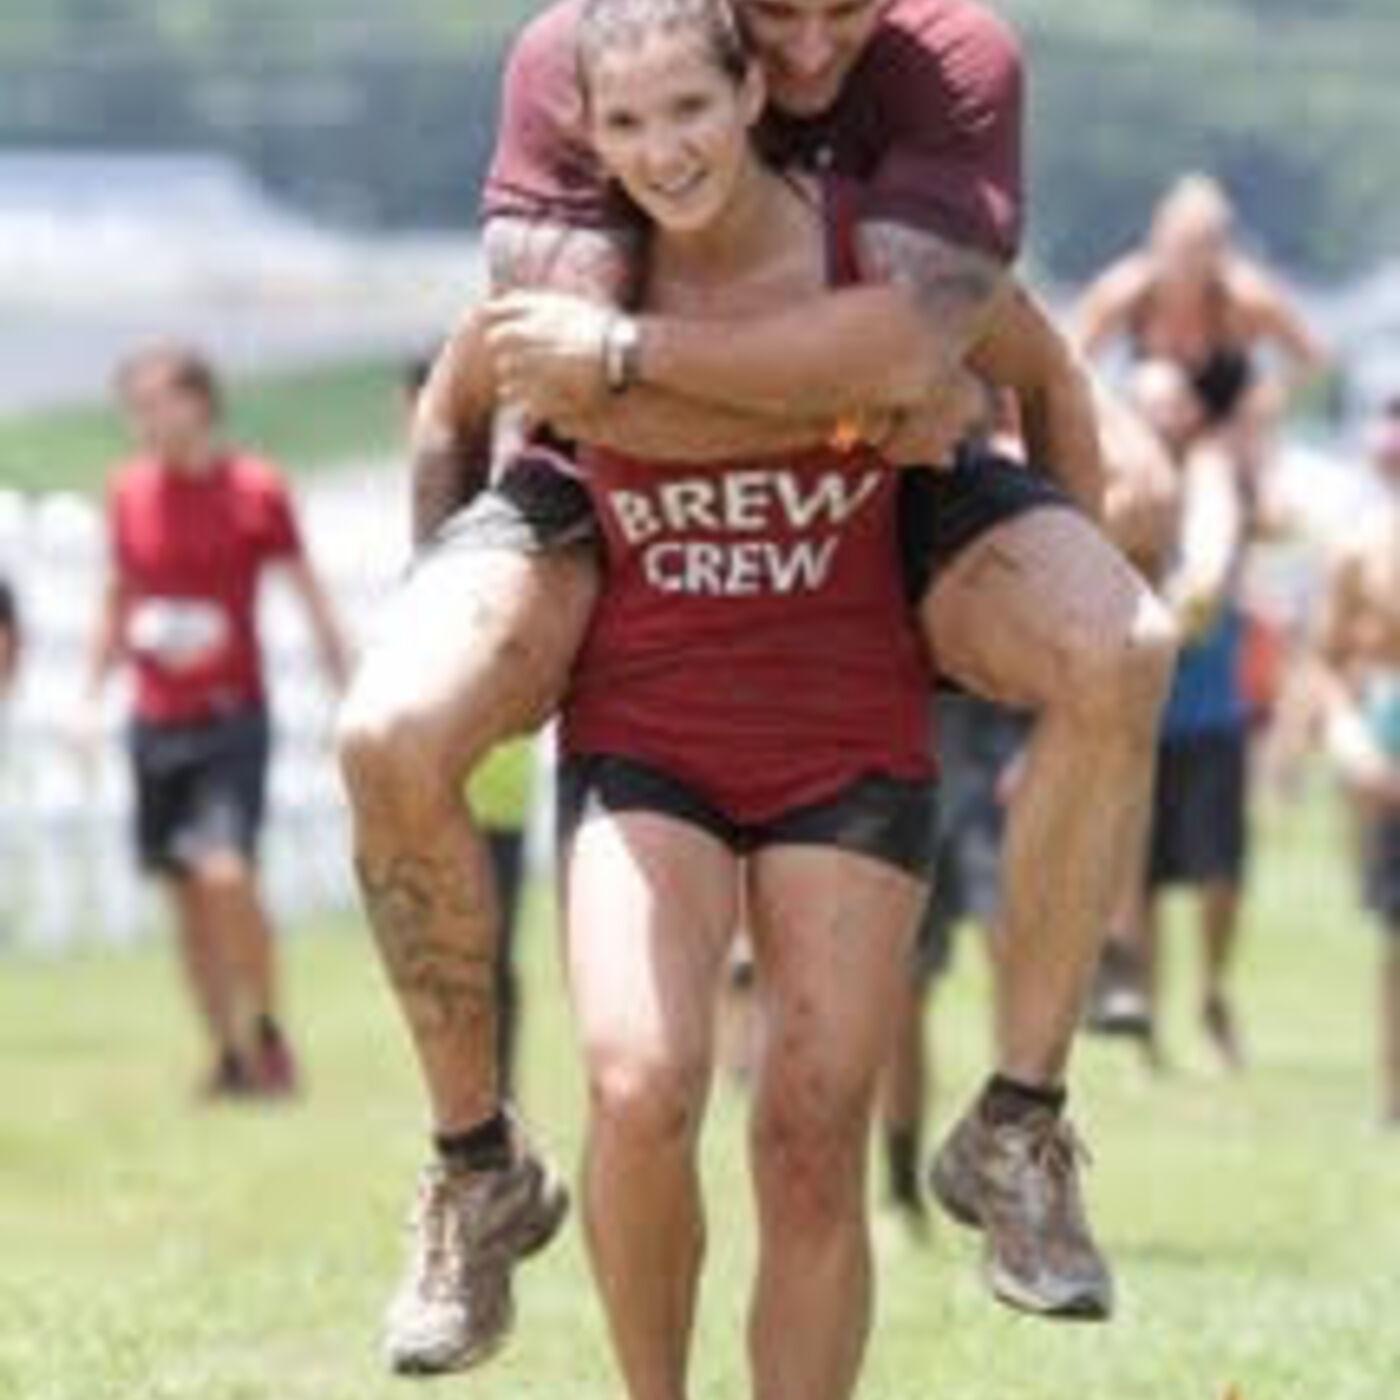 Elaine & Heath Brewer - Couple, Veteran, Founders of Humble Warrior Wellness Center (Season 3, Episode #49)